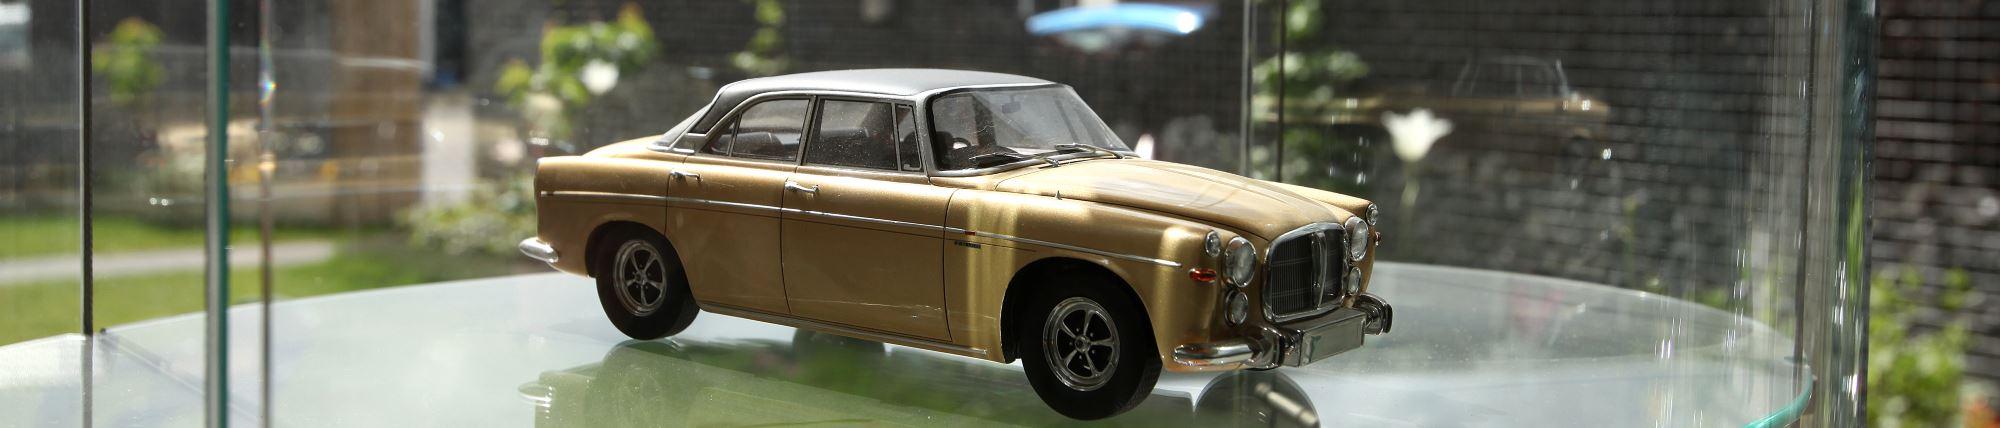 klassieke rover miniatuur